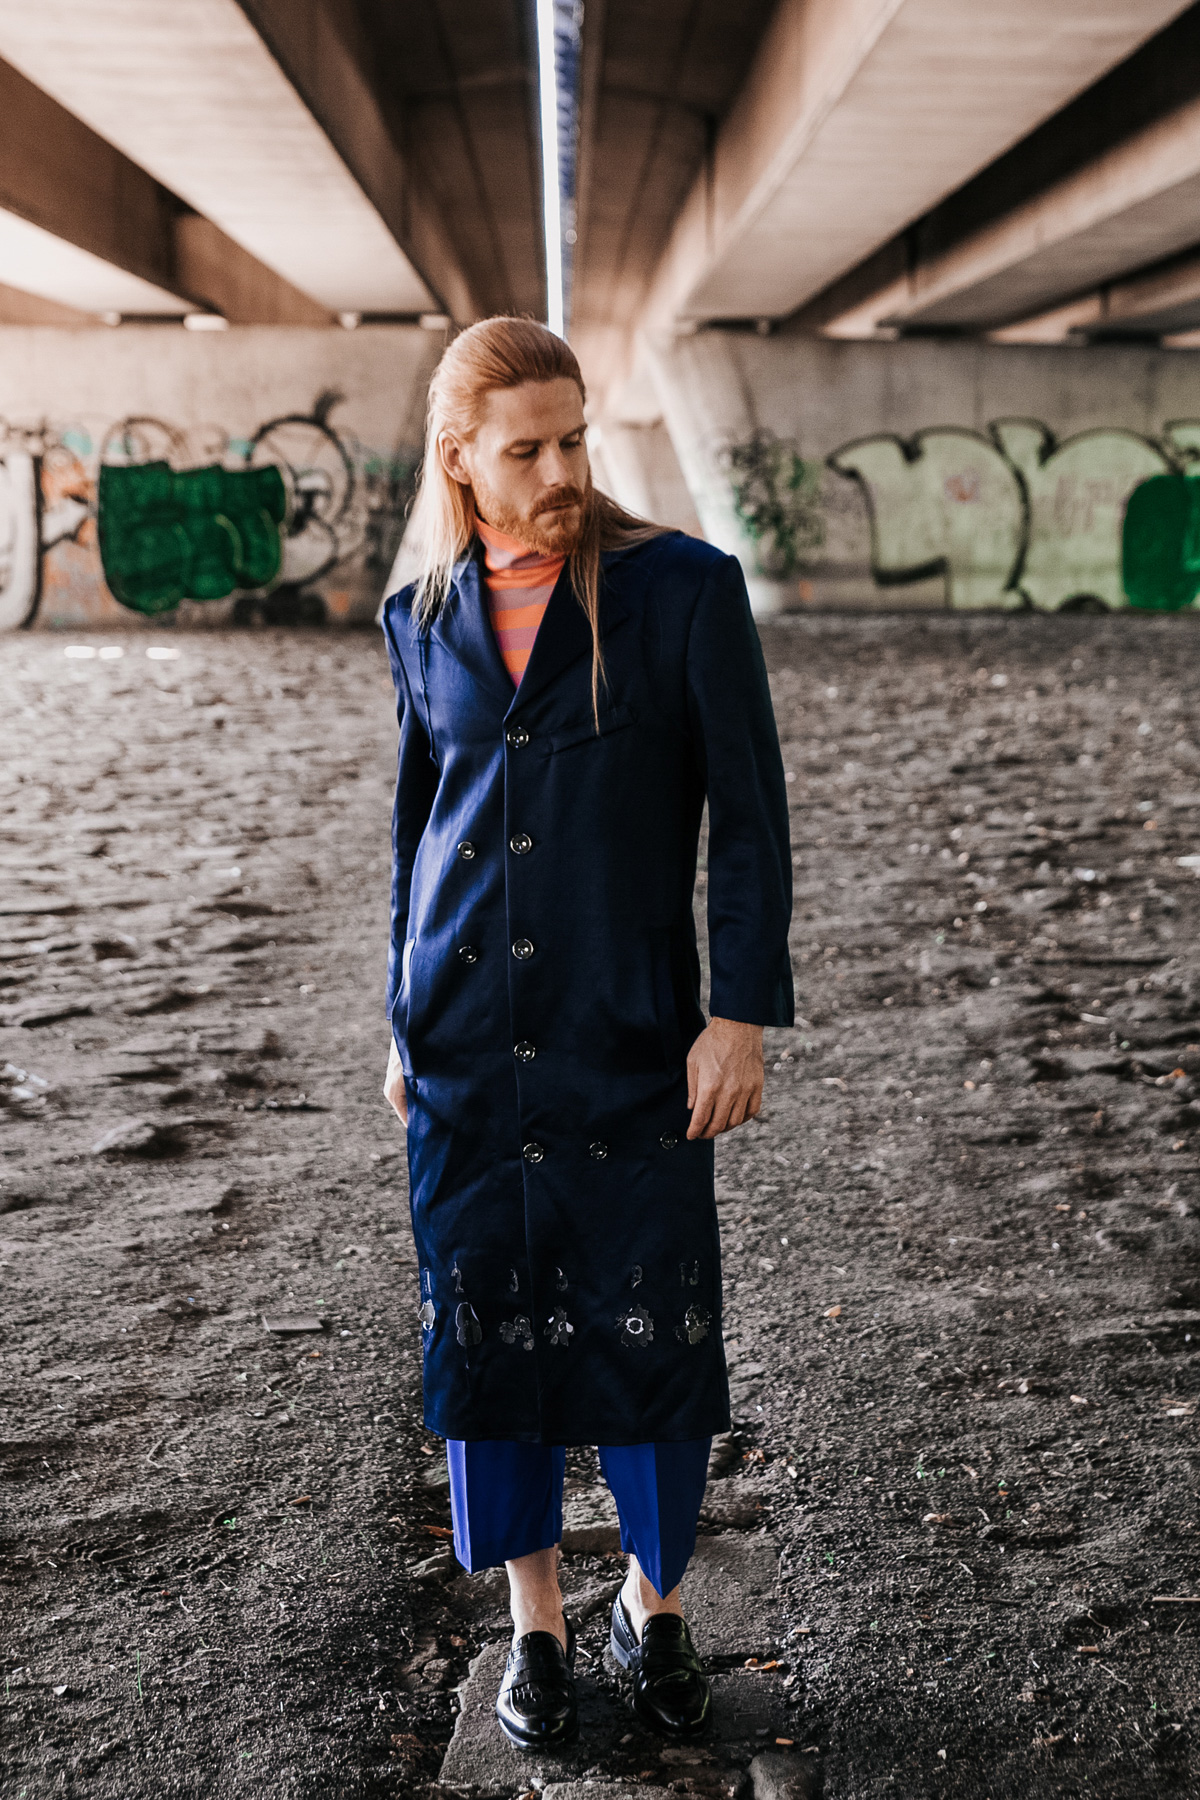 Nachwuchs-Designer-AMD-Malefashion-Style-Anzug-Mantel-Mode